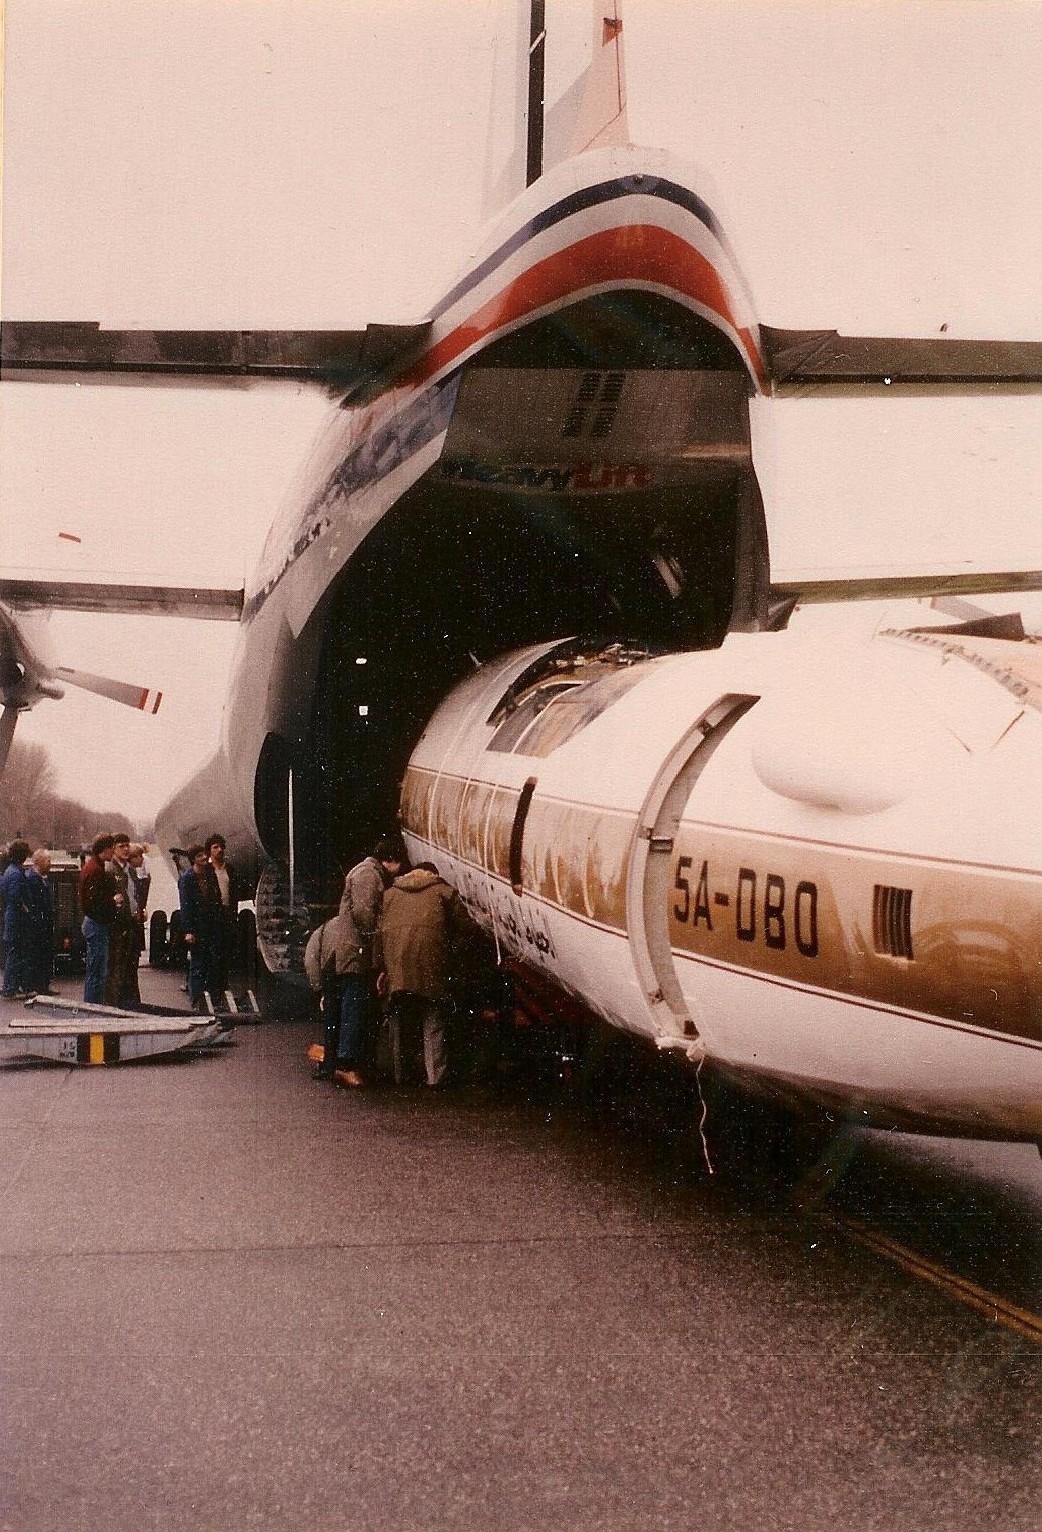 Naam: Ypenburg Short Belfaster, F-413 5A-DBO wordt uit geladen.jpg Bekeken: 89 Grootte: 483,4 KB